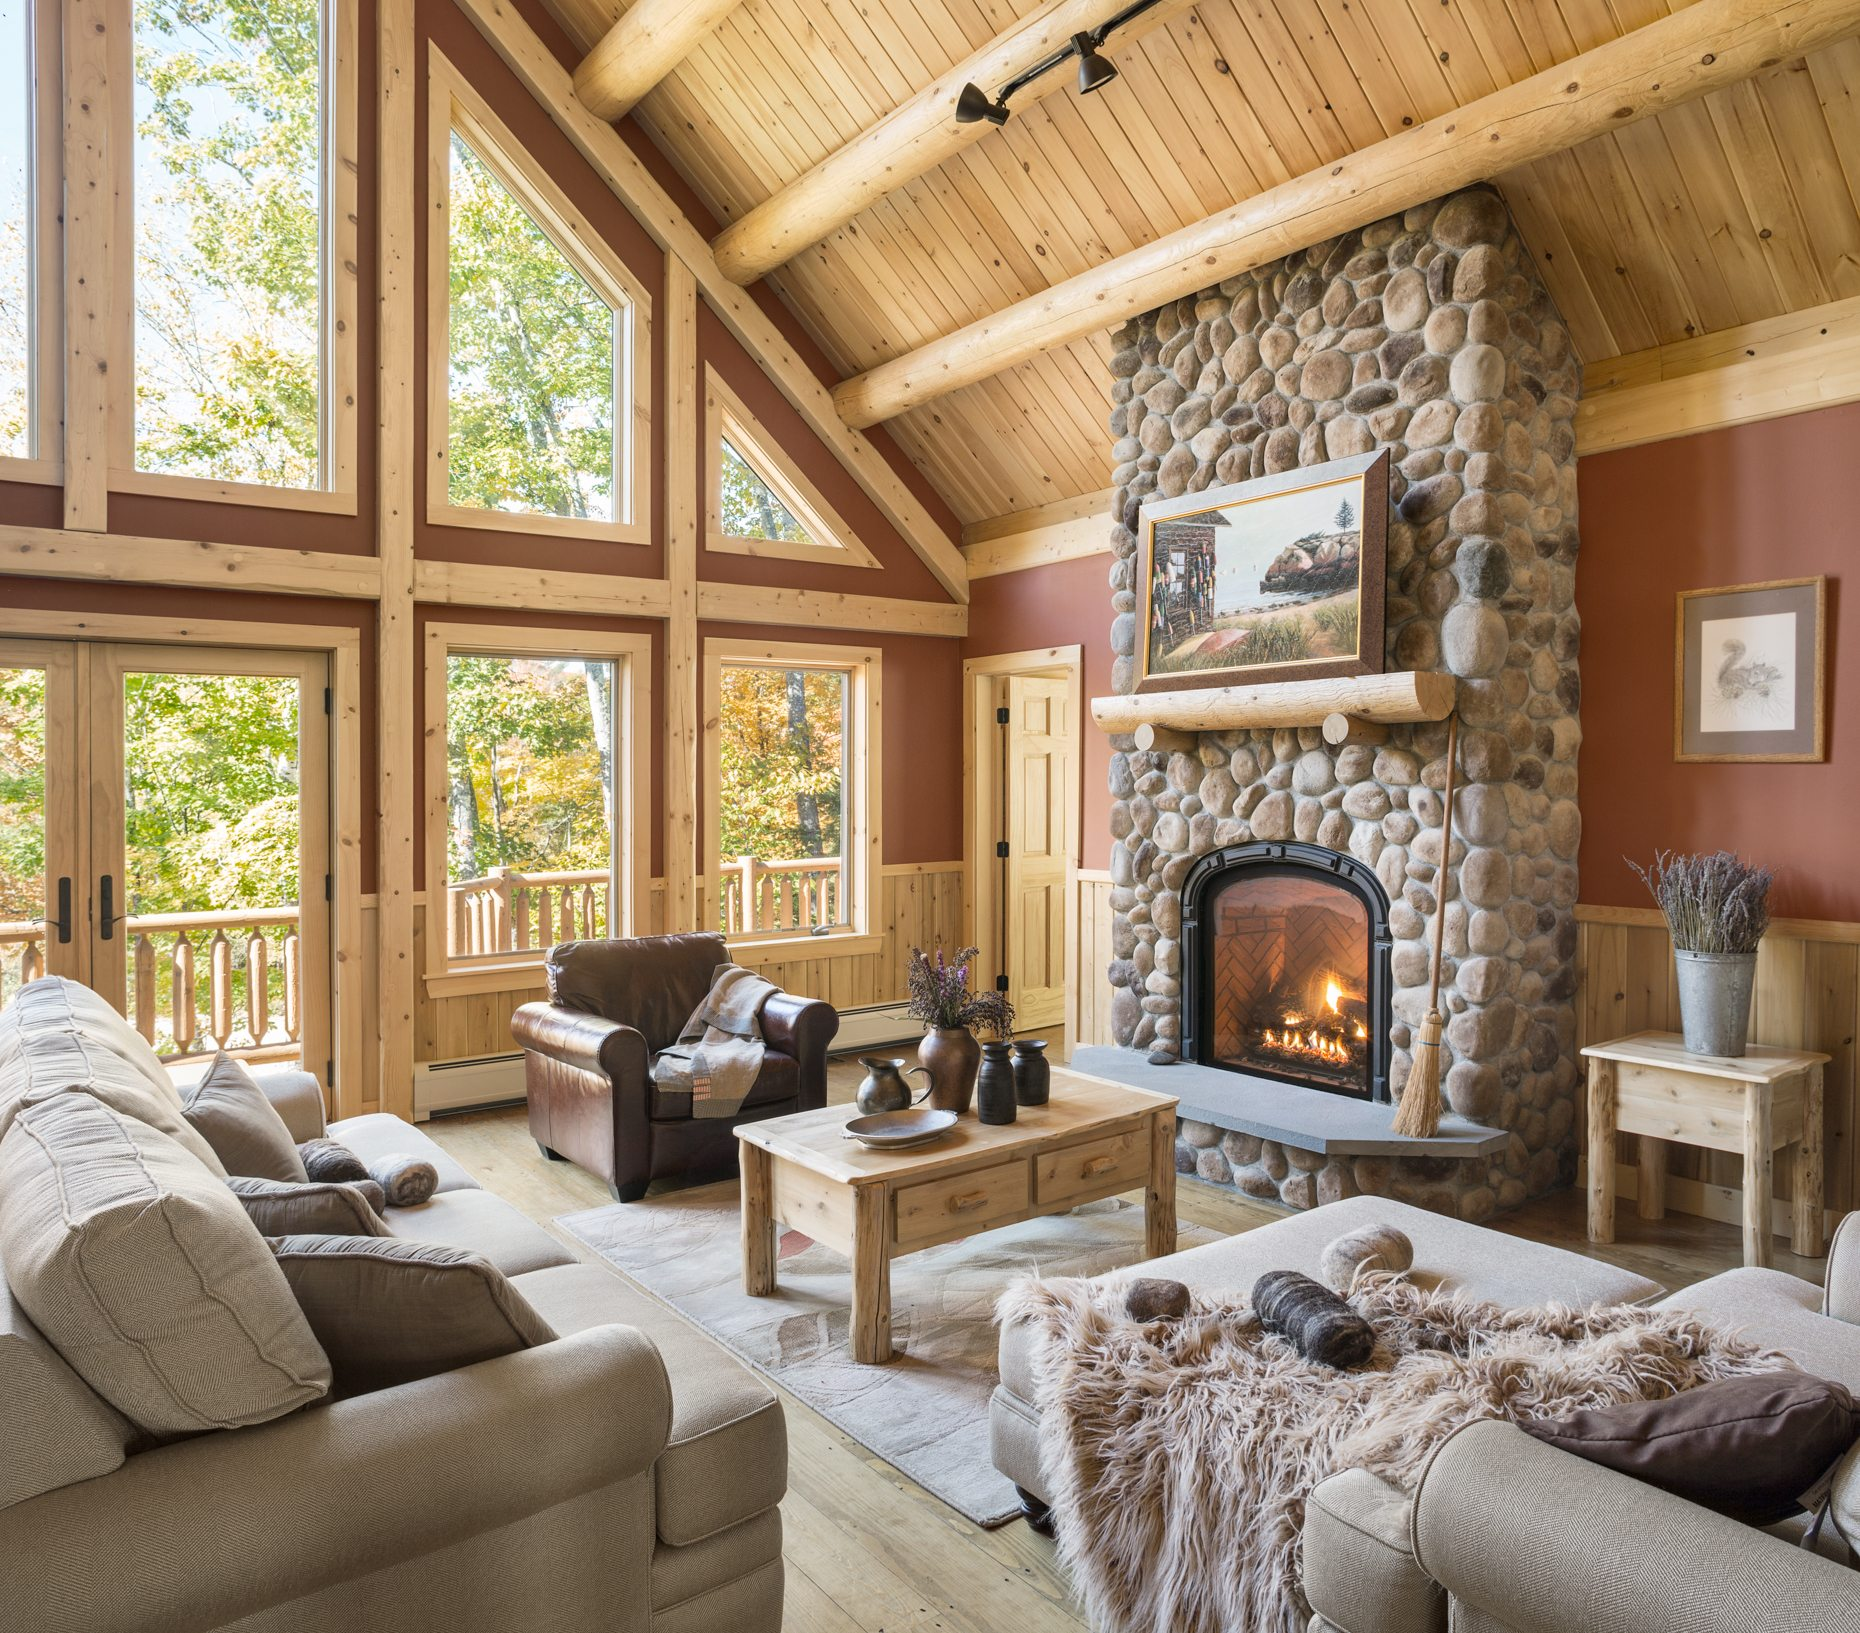 Interior Wall Options Open Up Design Horizons